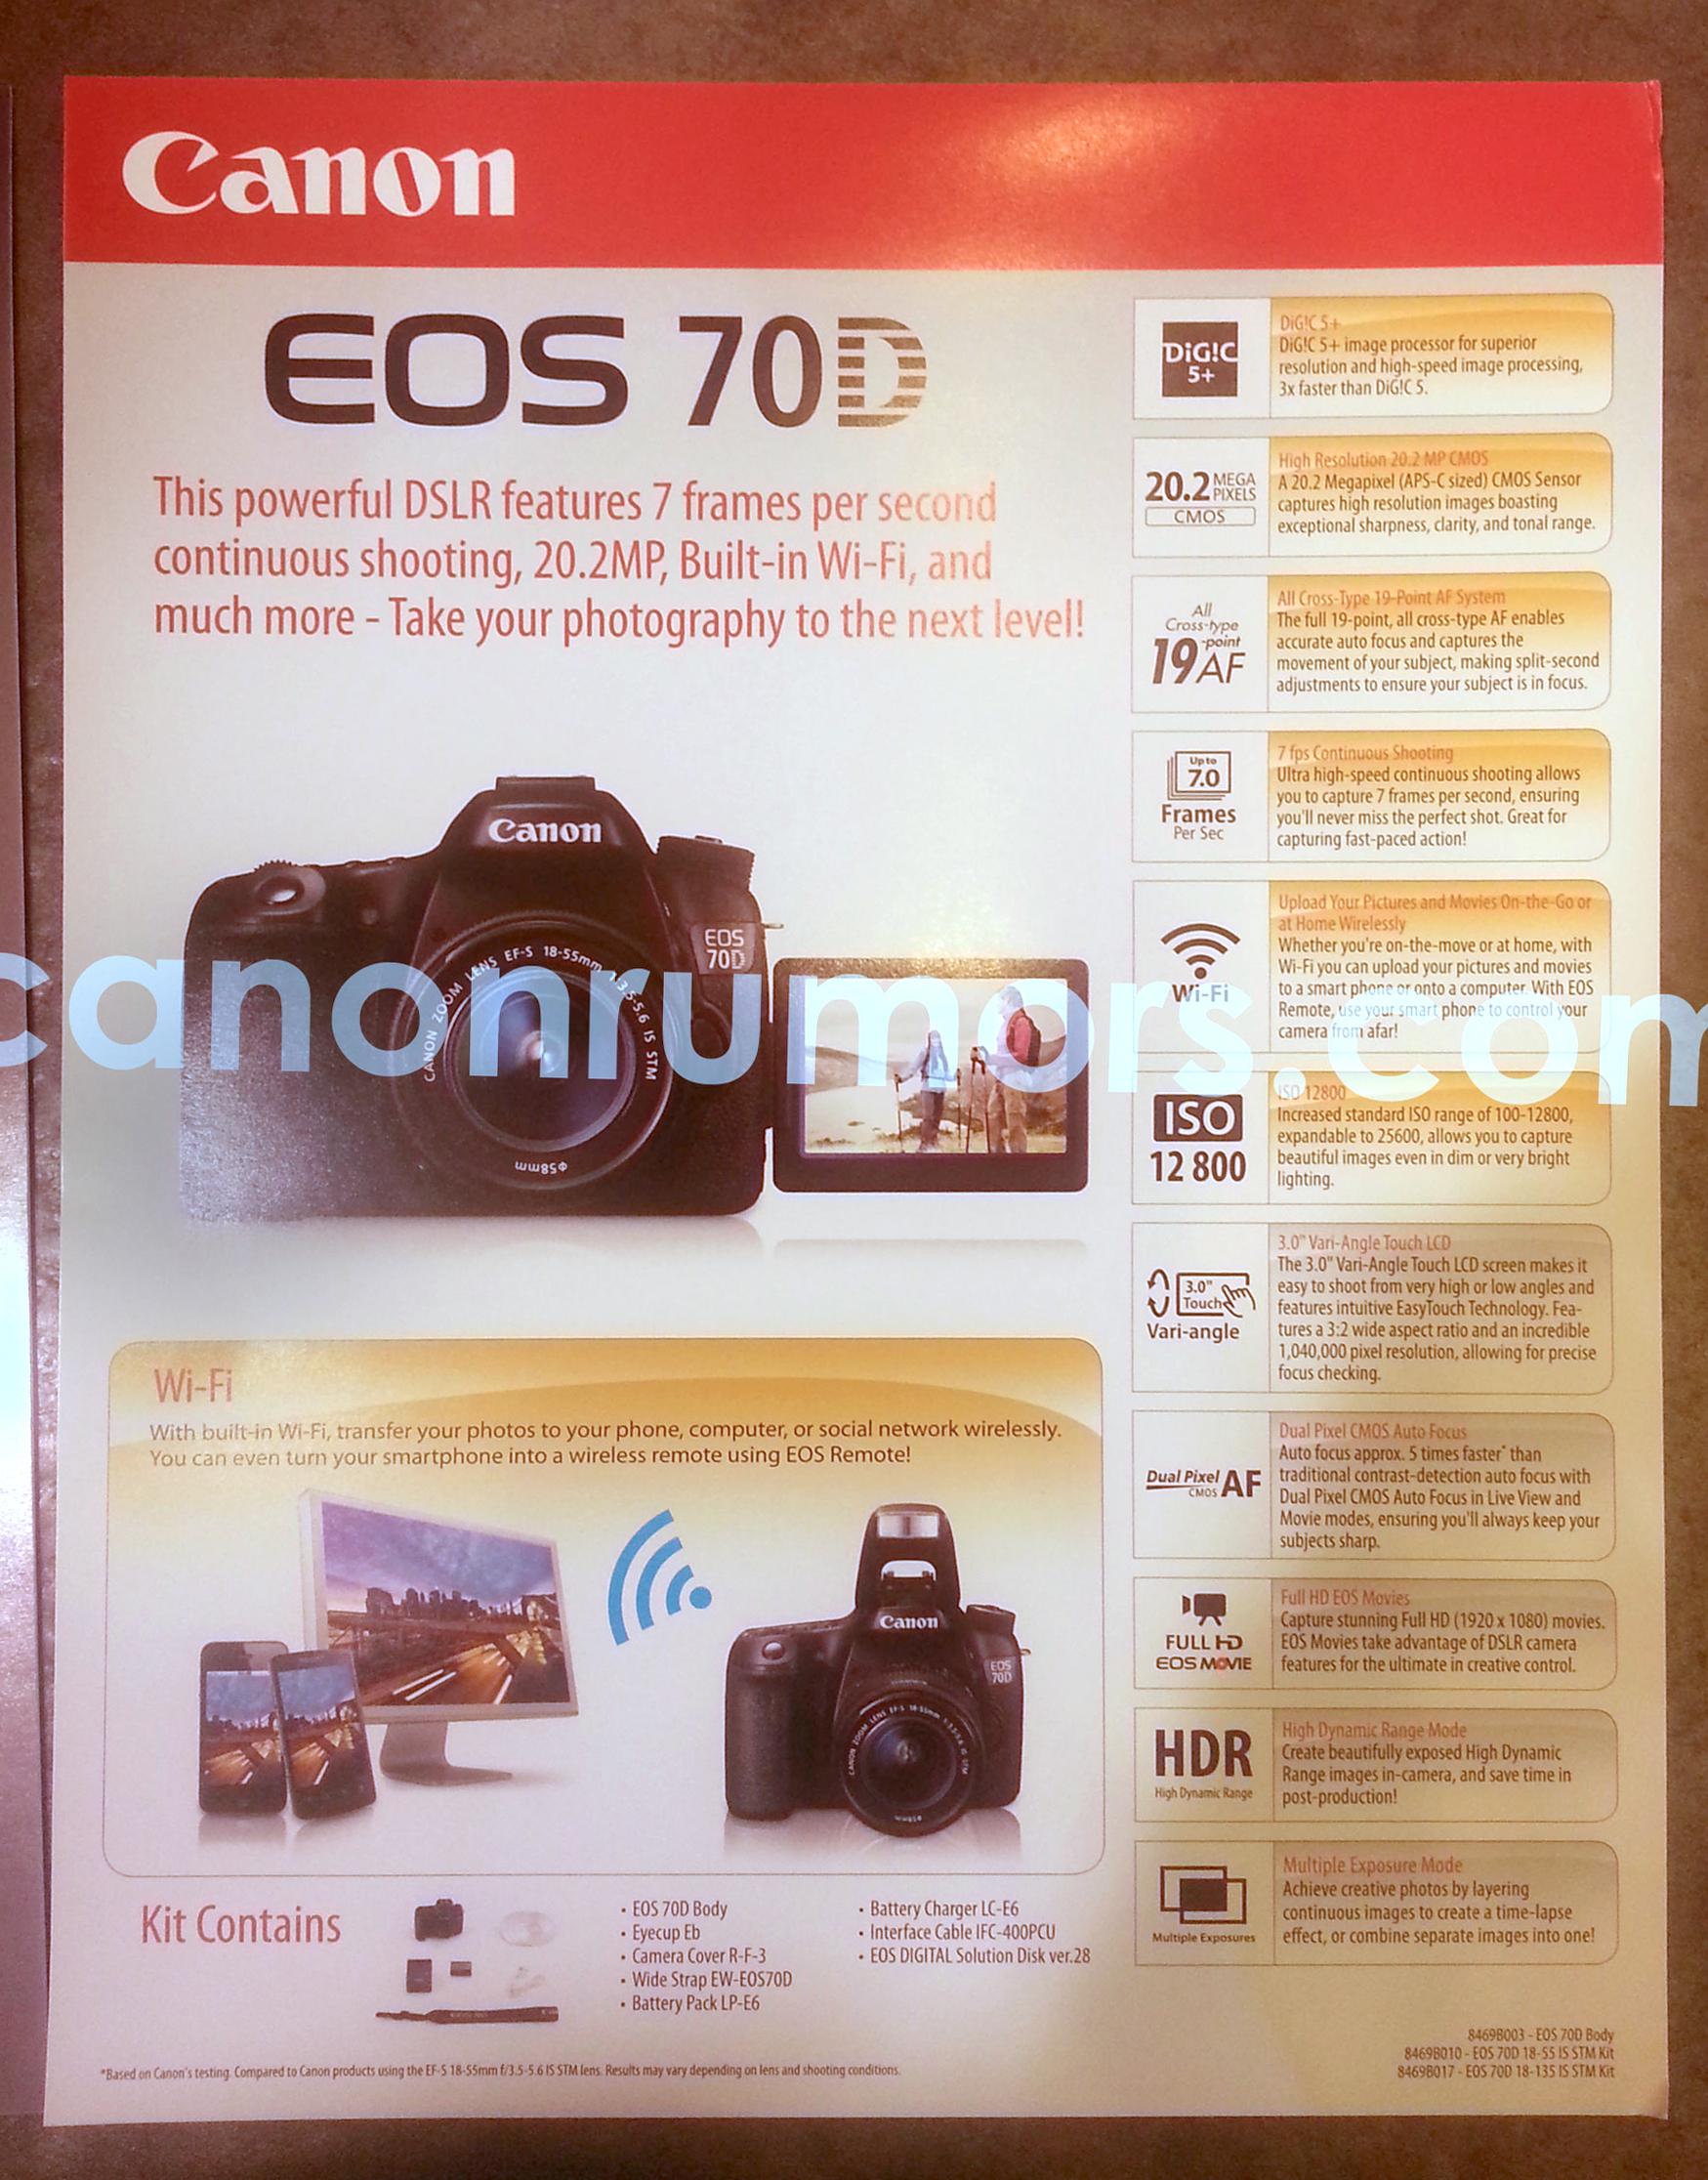 Tabatud: Canon EOS 70D fotode ning andmetega reklaam